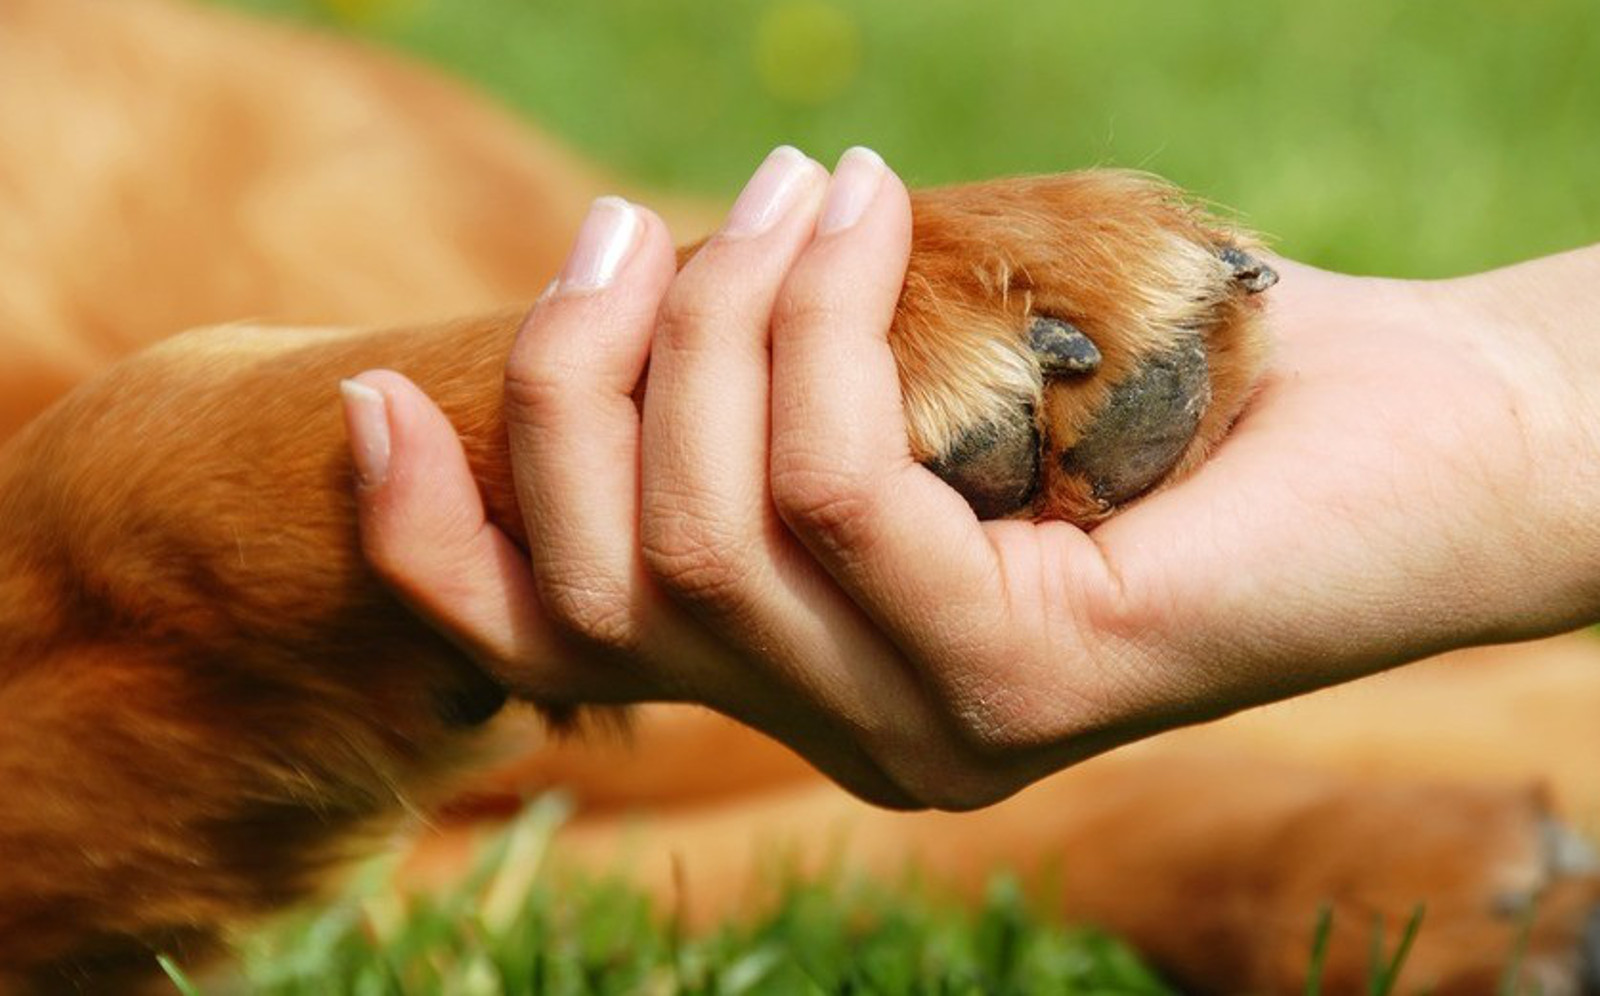 Živali so od marca 2020 uradno čuteča bitja.